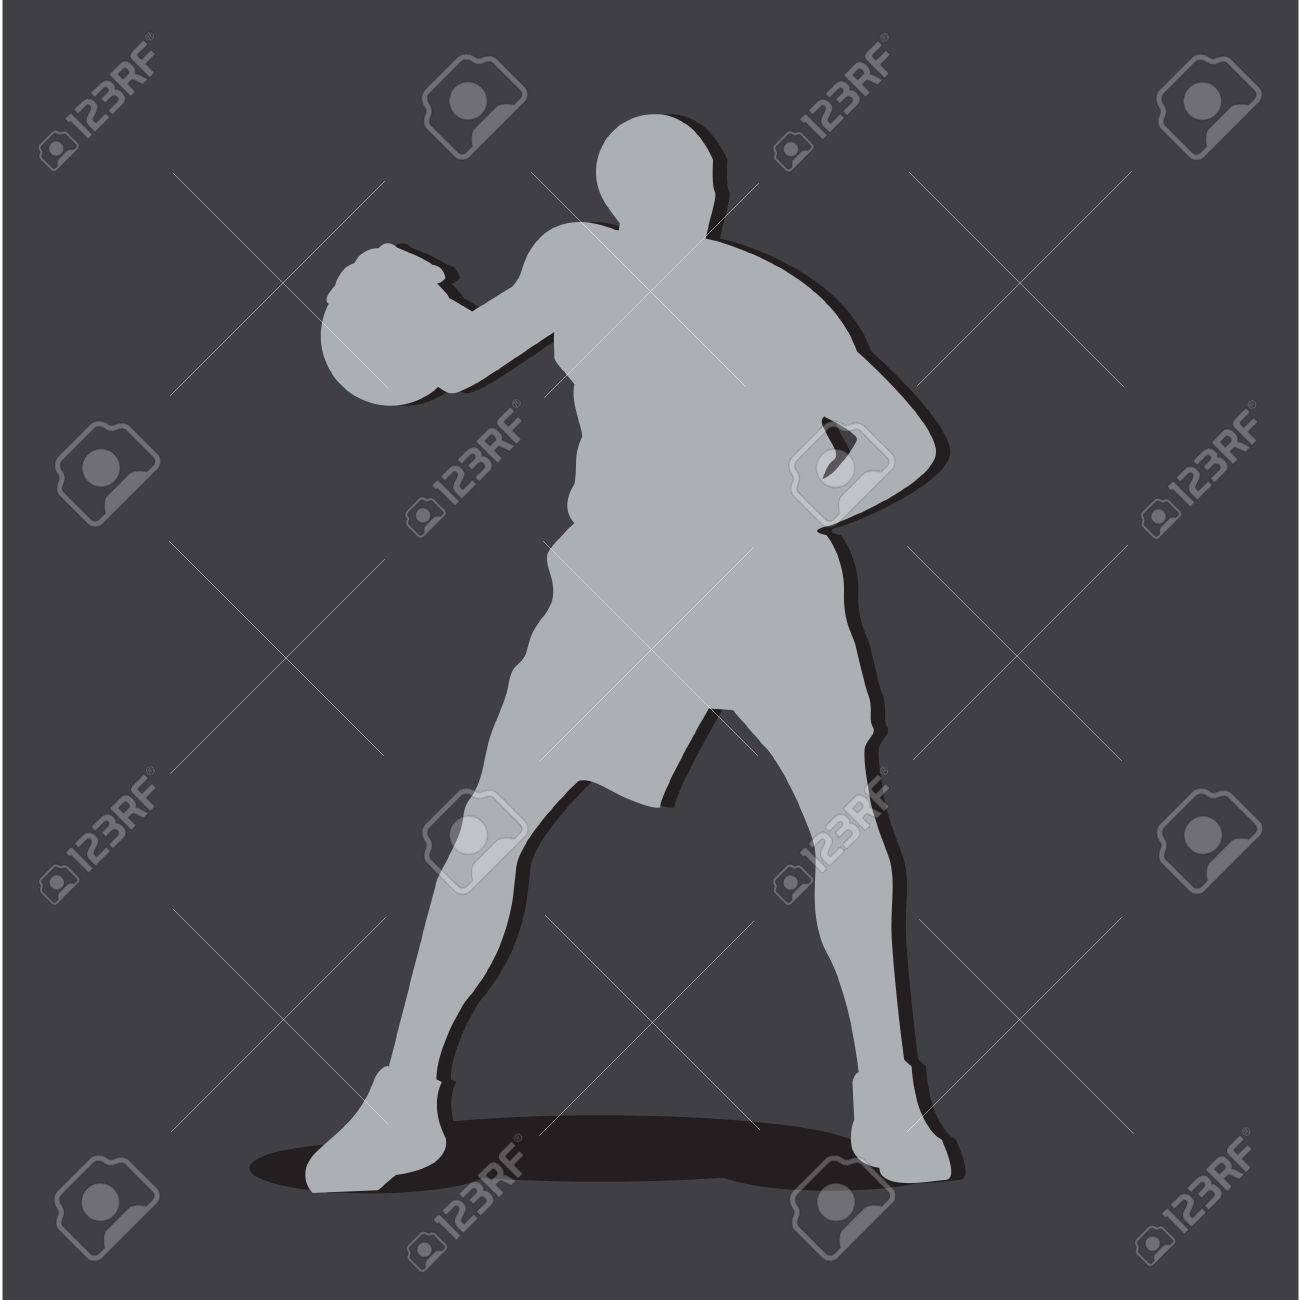 Basketball Player silhouette Stock Vector - 19019438